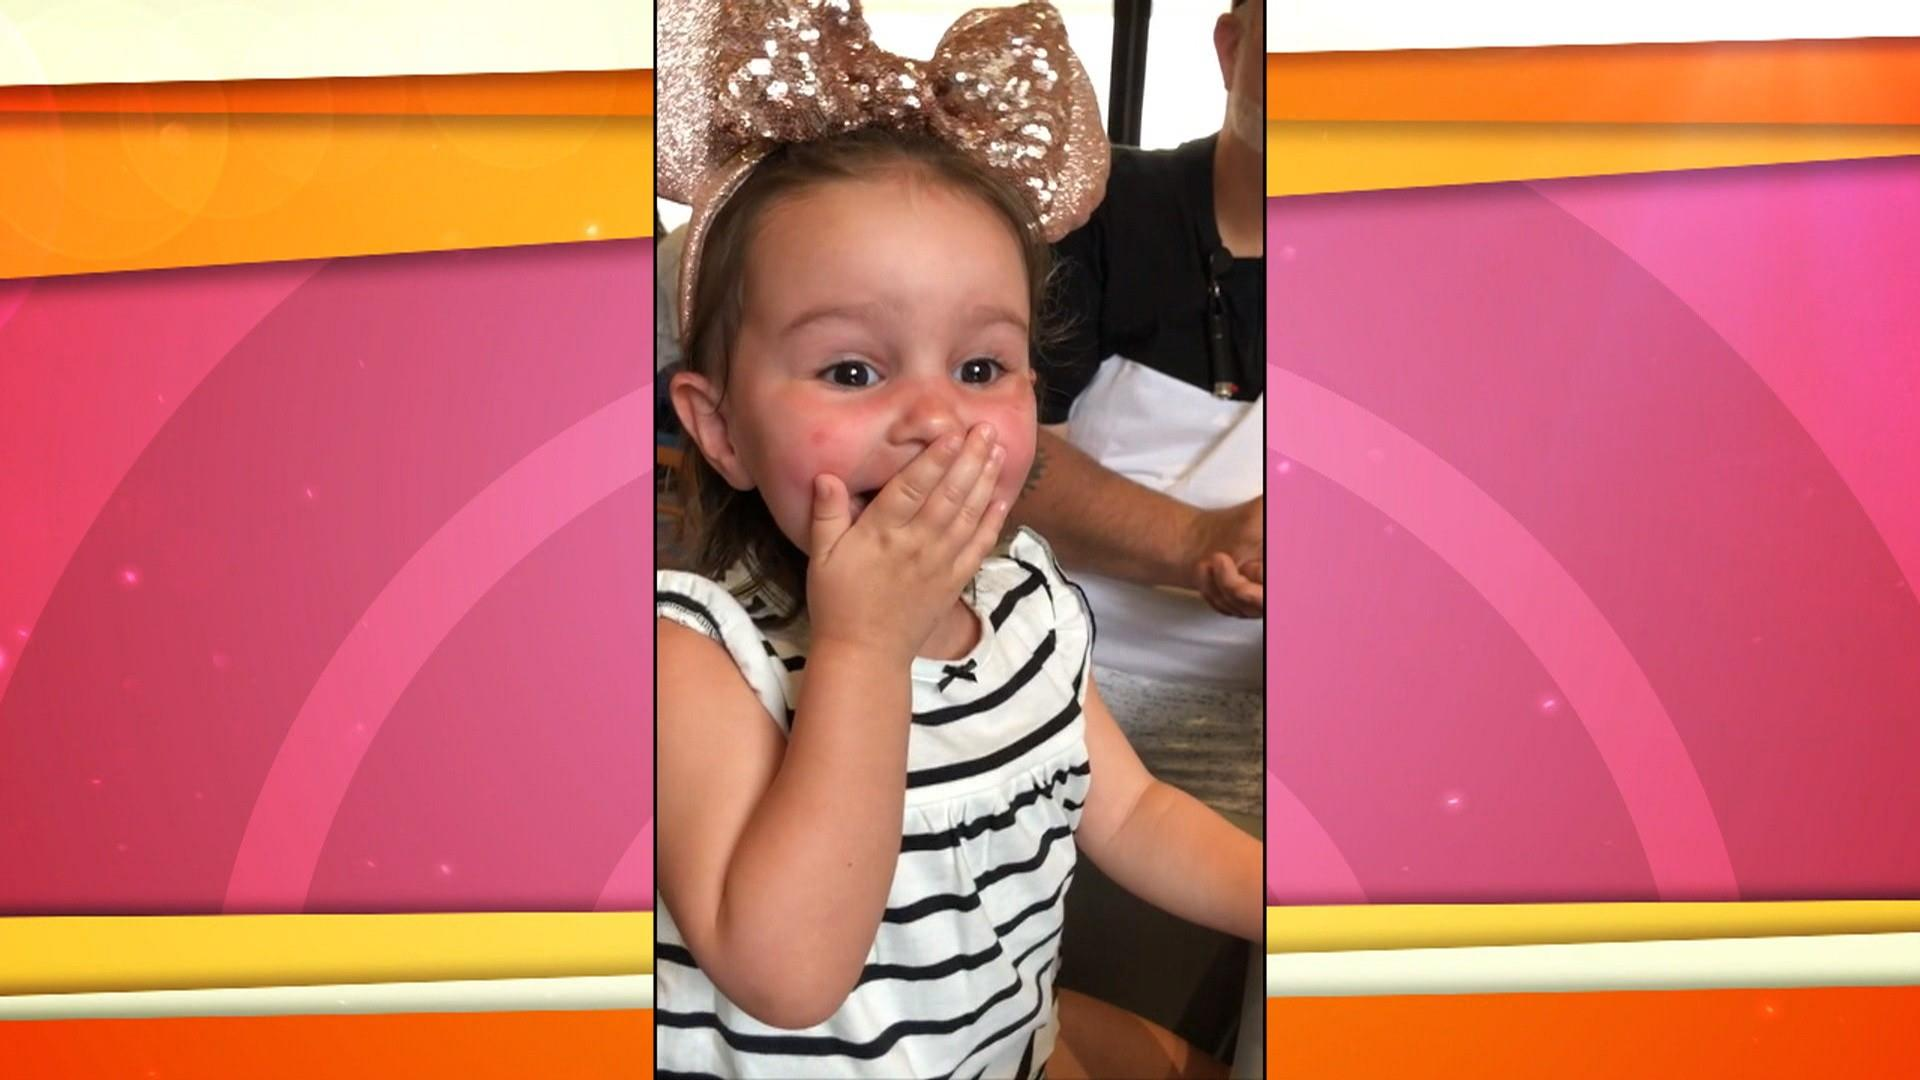 Little girl visiting Disney World ecstatic over Donald Duck sighting